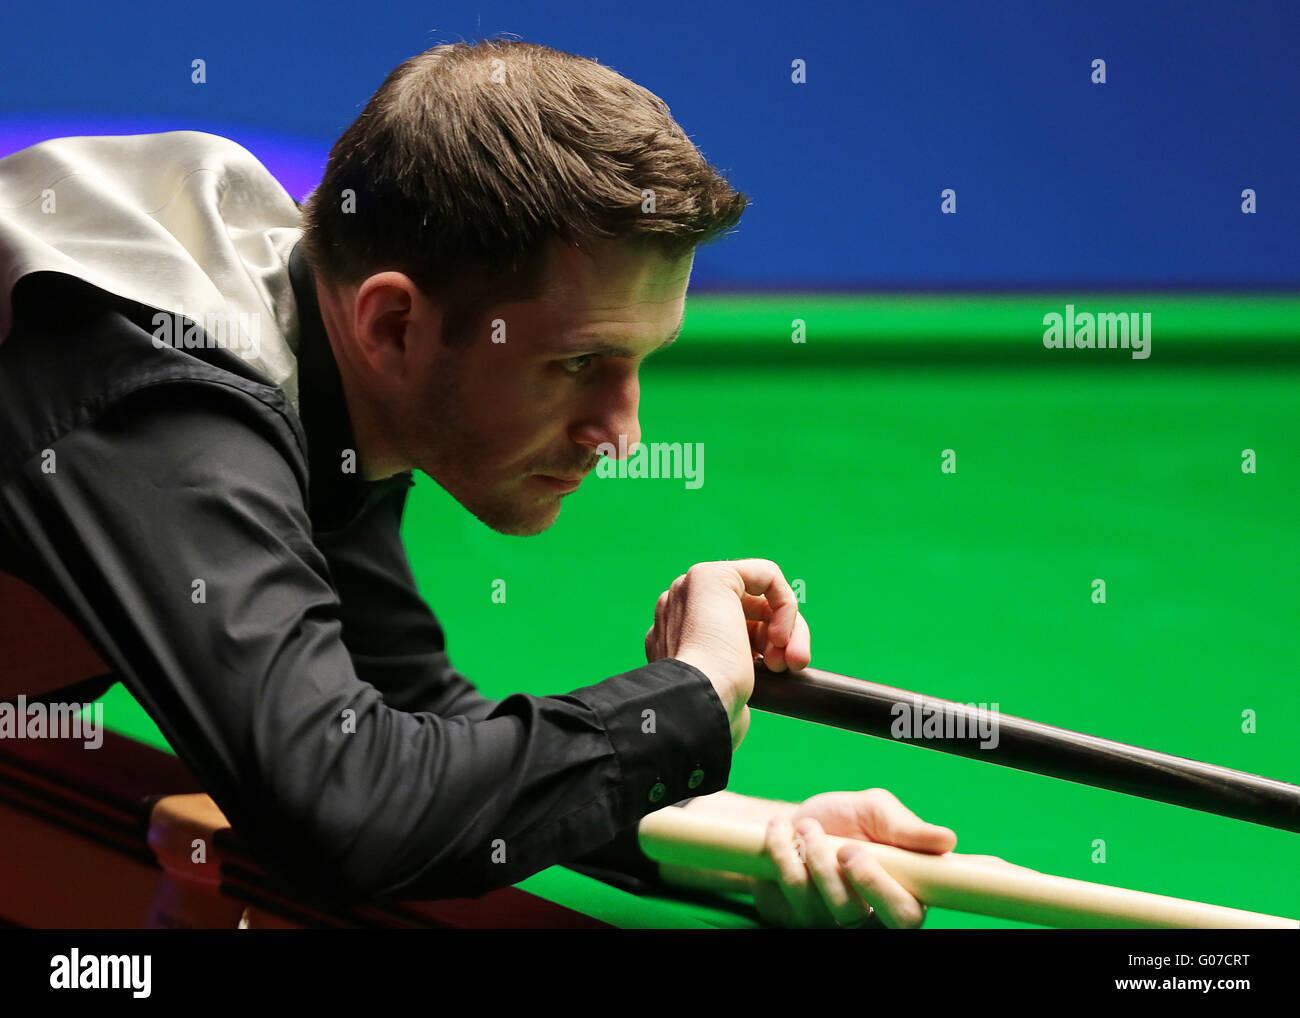 El crisol, Sheffield, Reino Unido. 30 abr, 2016. World Snooker Championship. Semifinales, Mark Selby frente a Marco Imagen De Stock